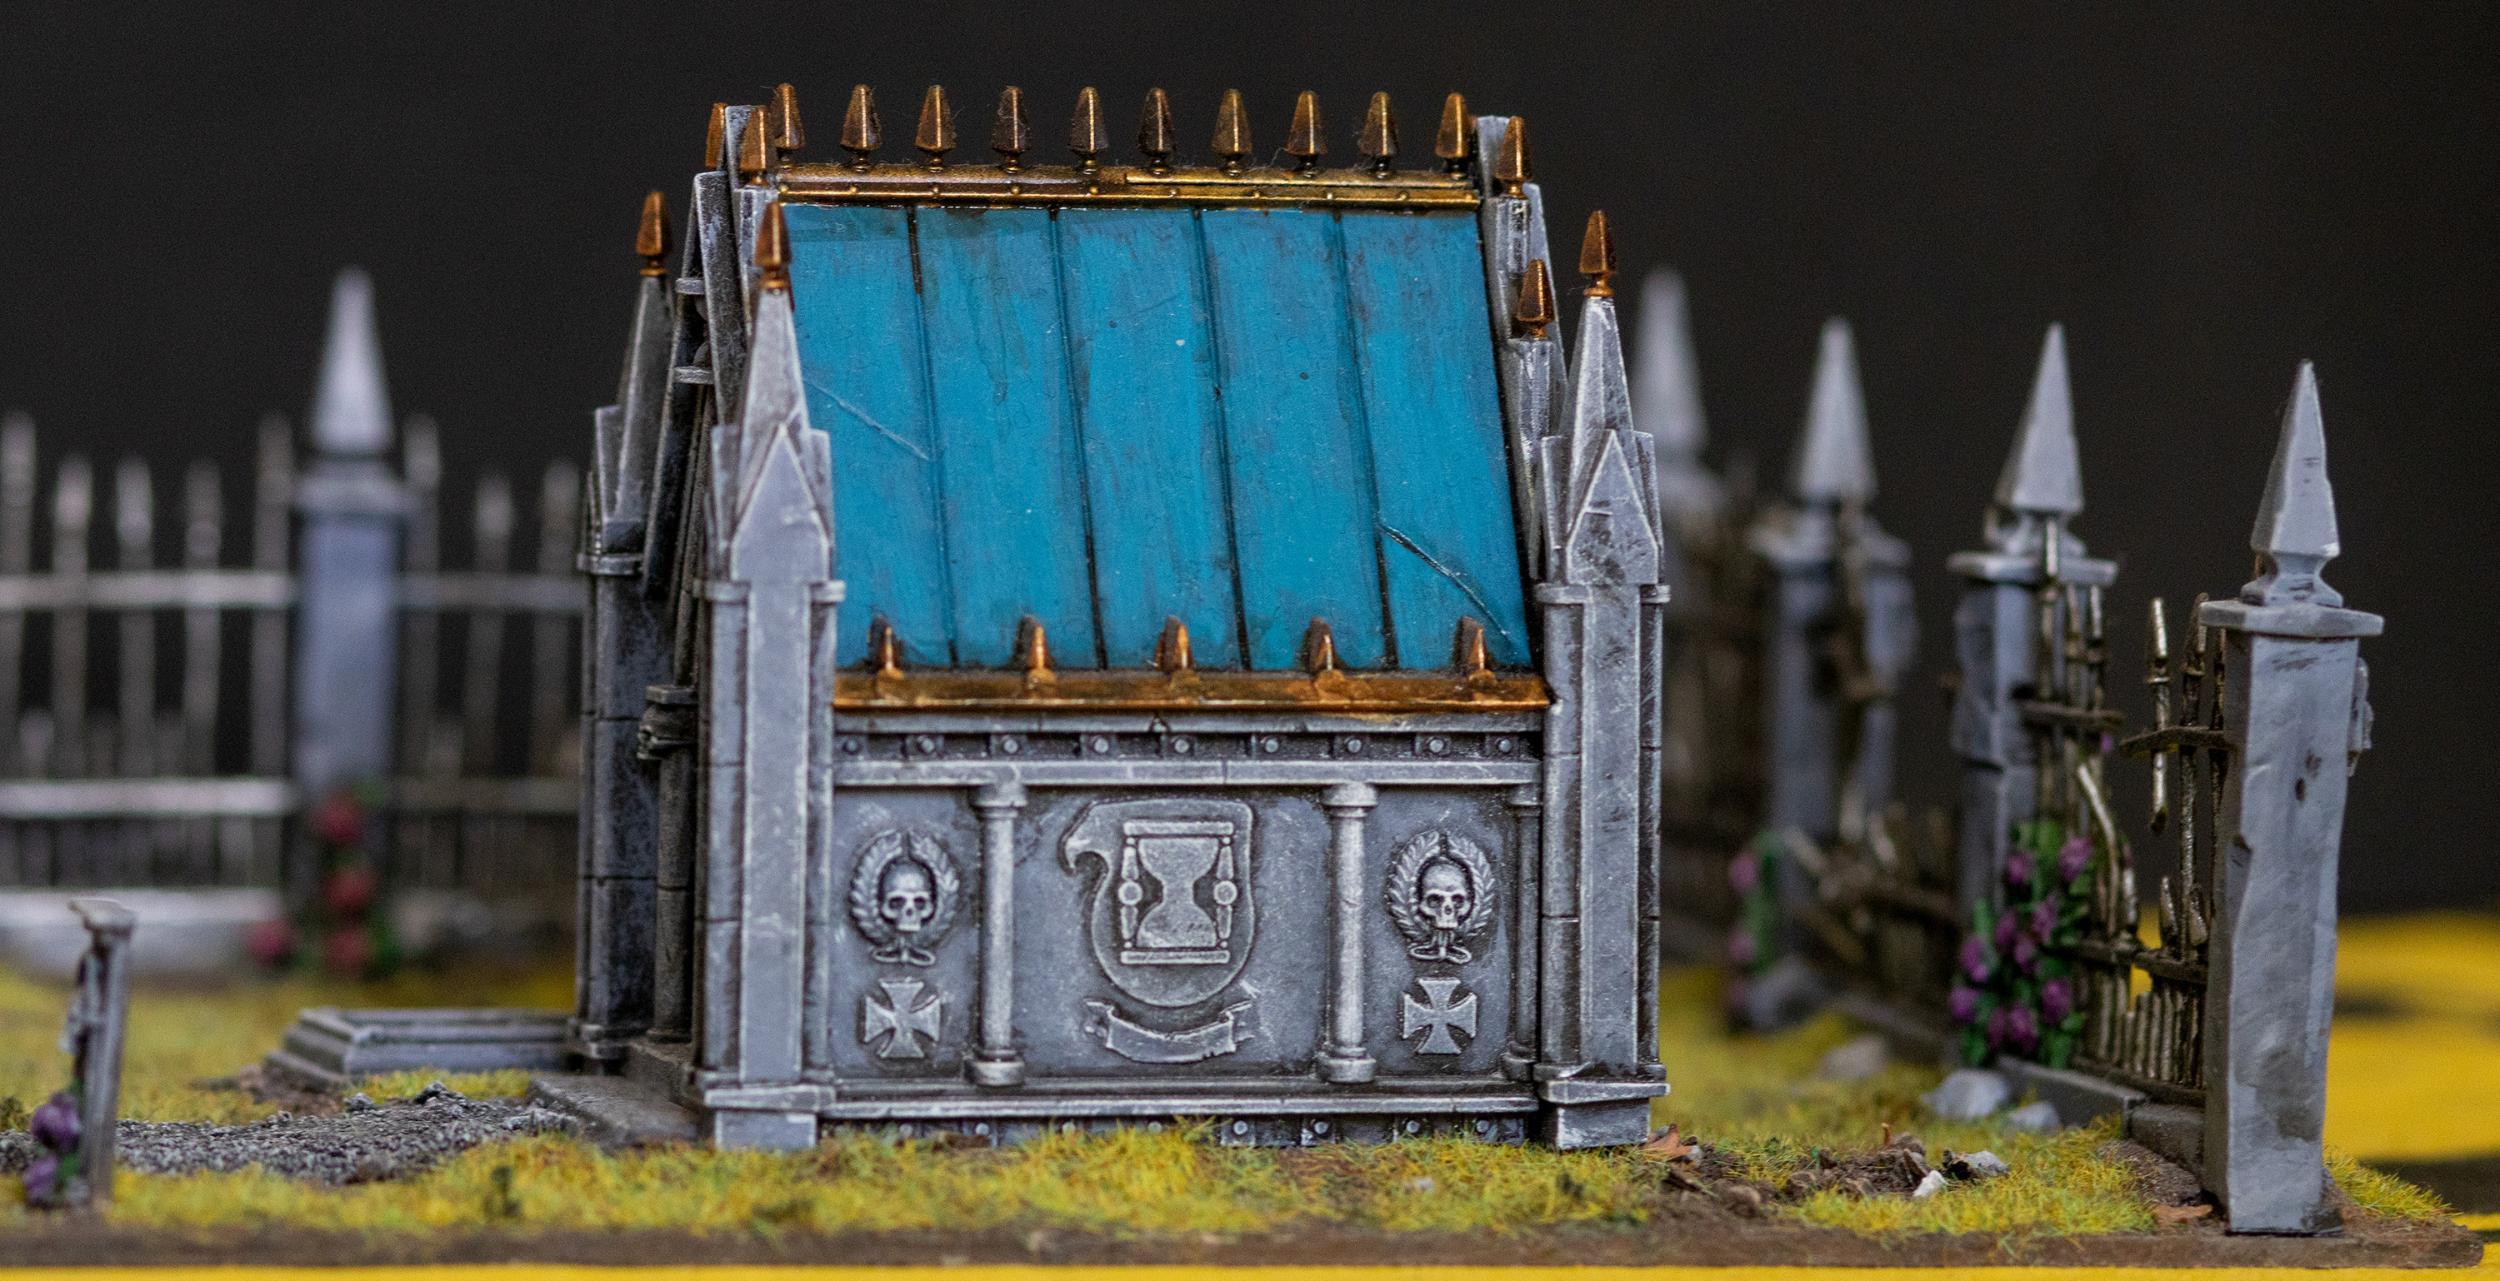 Friedhof_2020_4_s.jpg.2d1f66274131ca0705e7454822f13d99.jpg